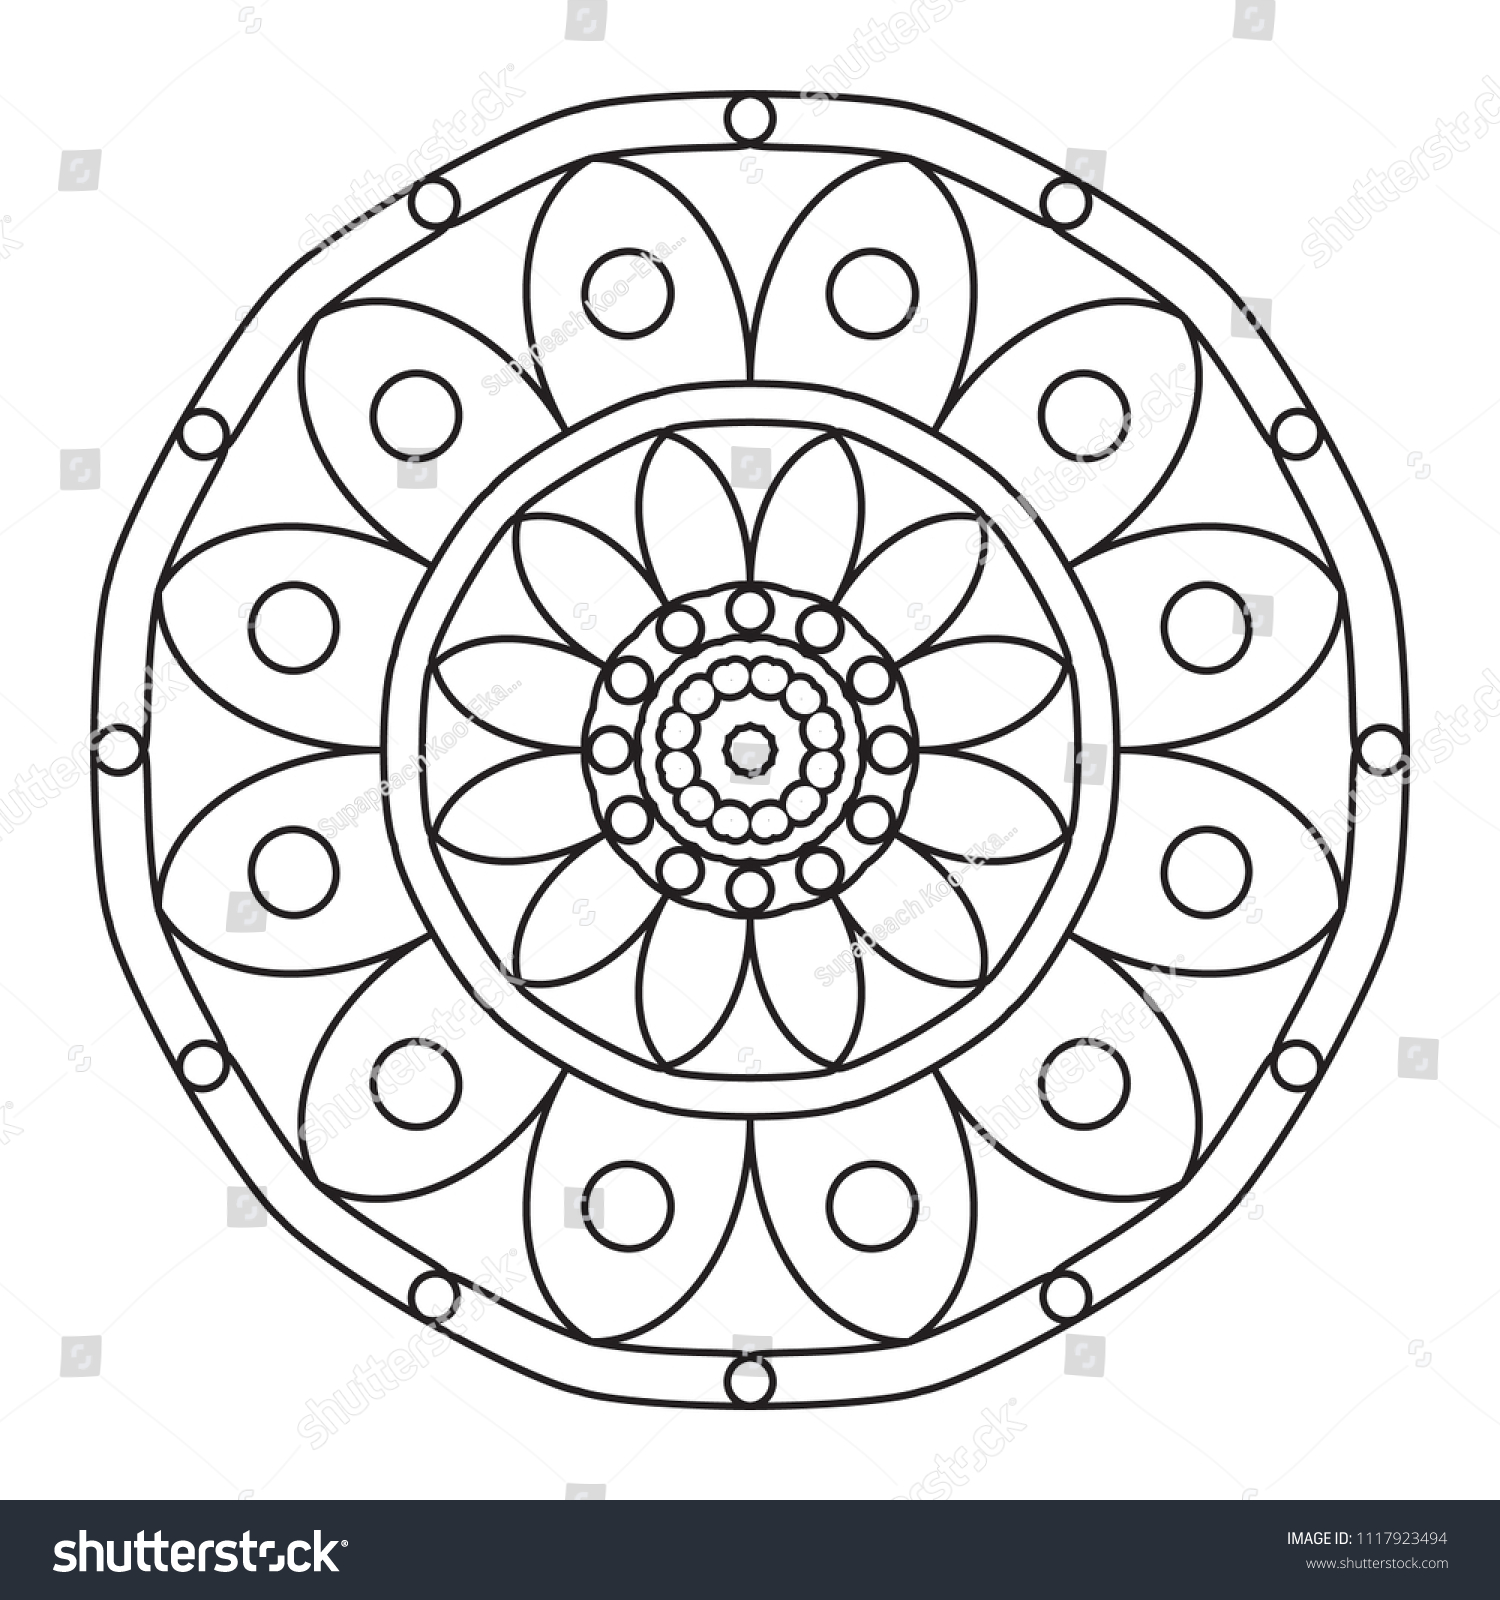 Easy Mandalas Basic Simple Mandala Pattern Stock Illustration 1117923494